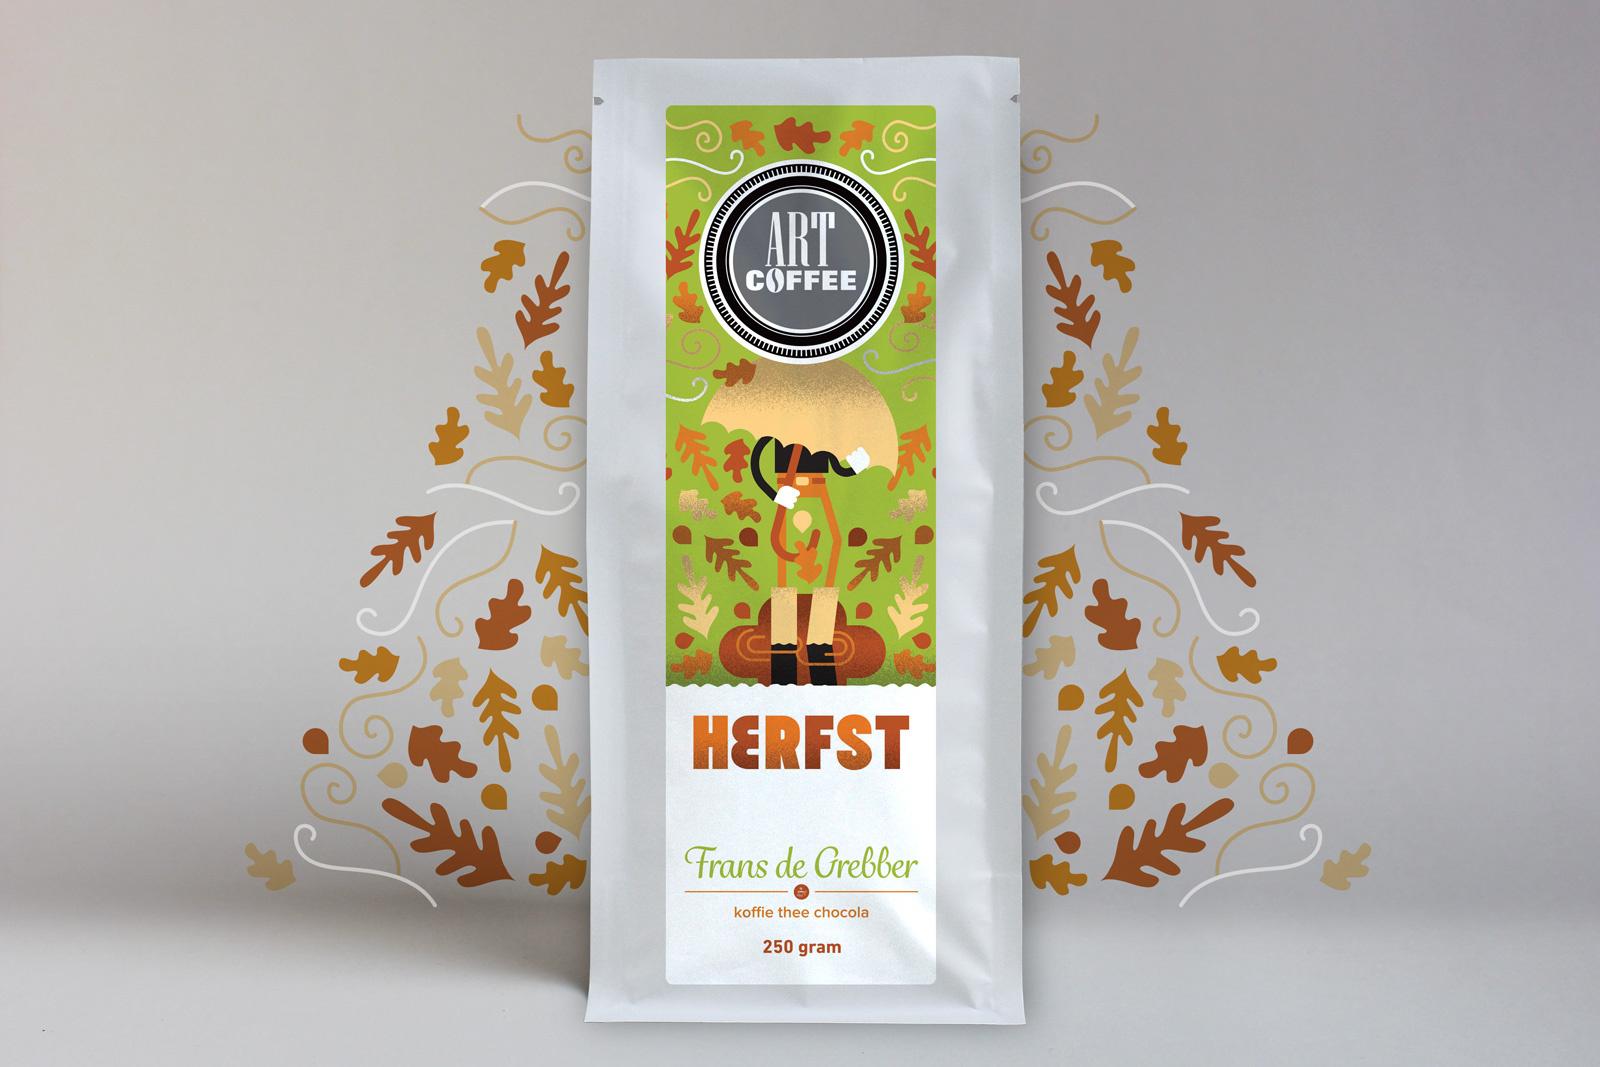 ARTcoffee HERFST koffie